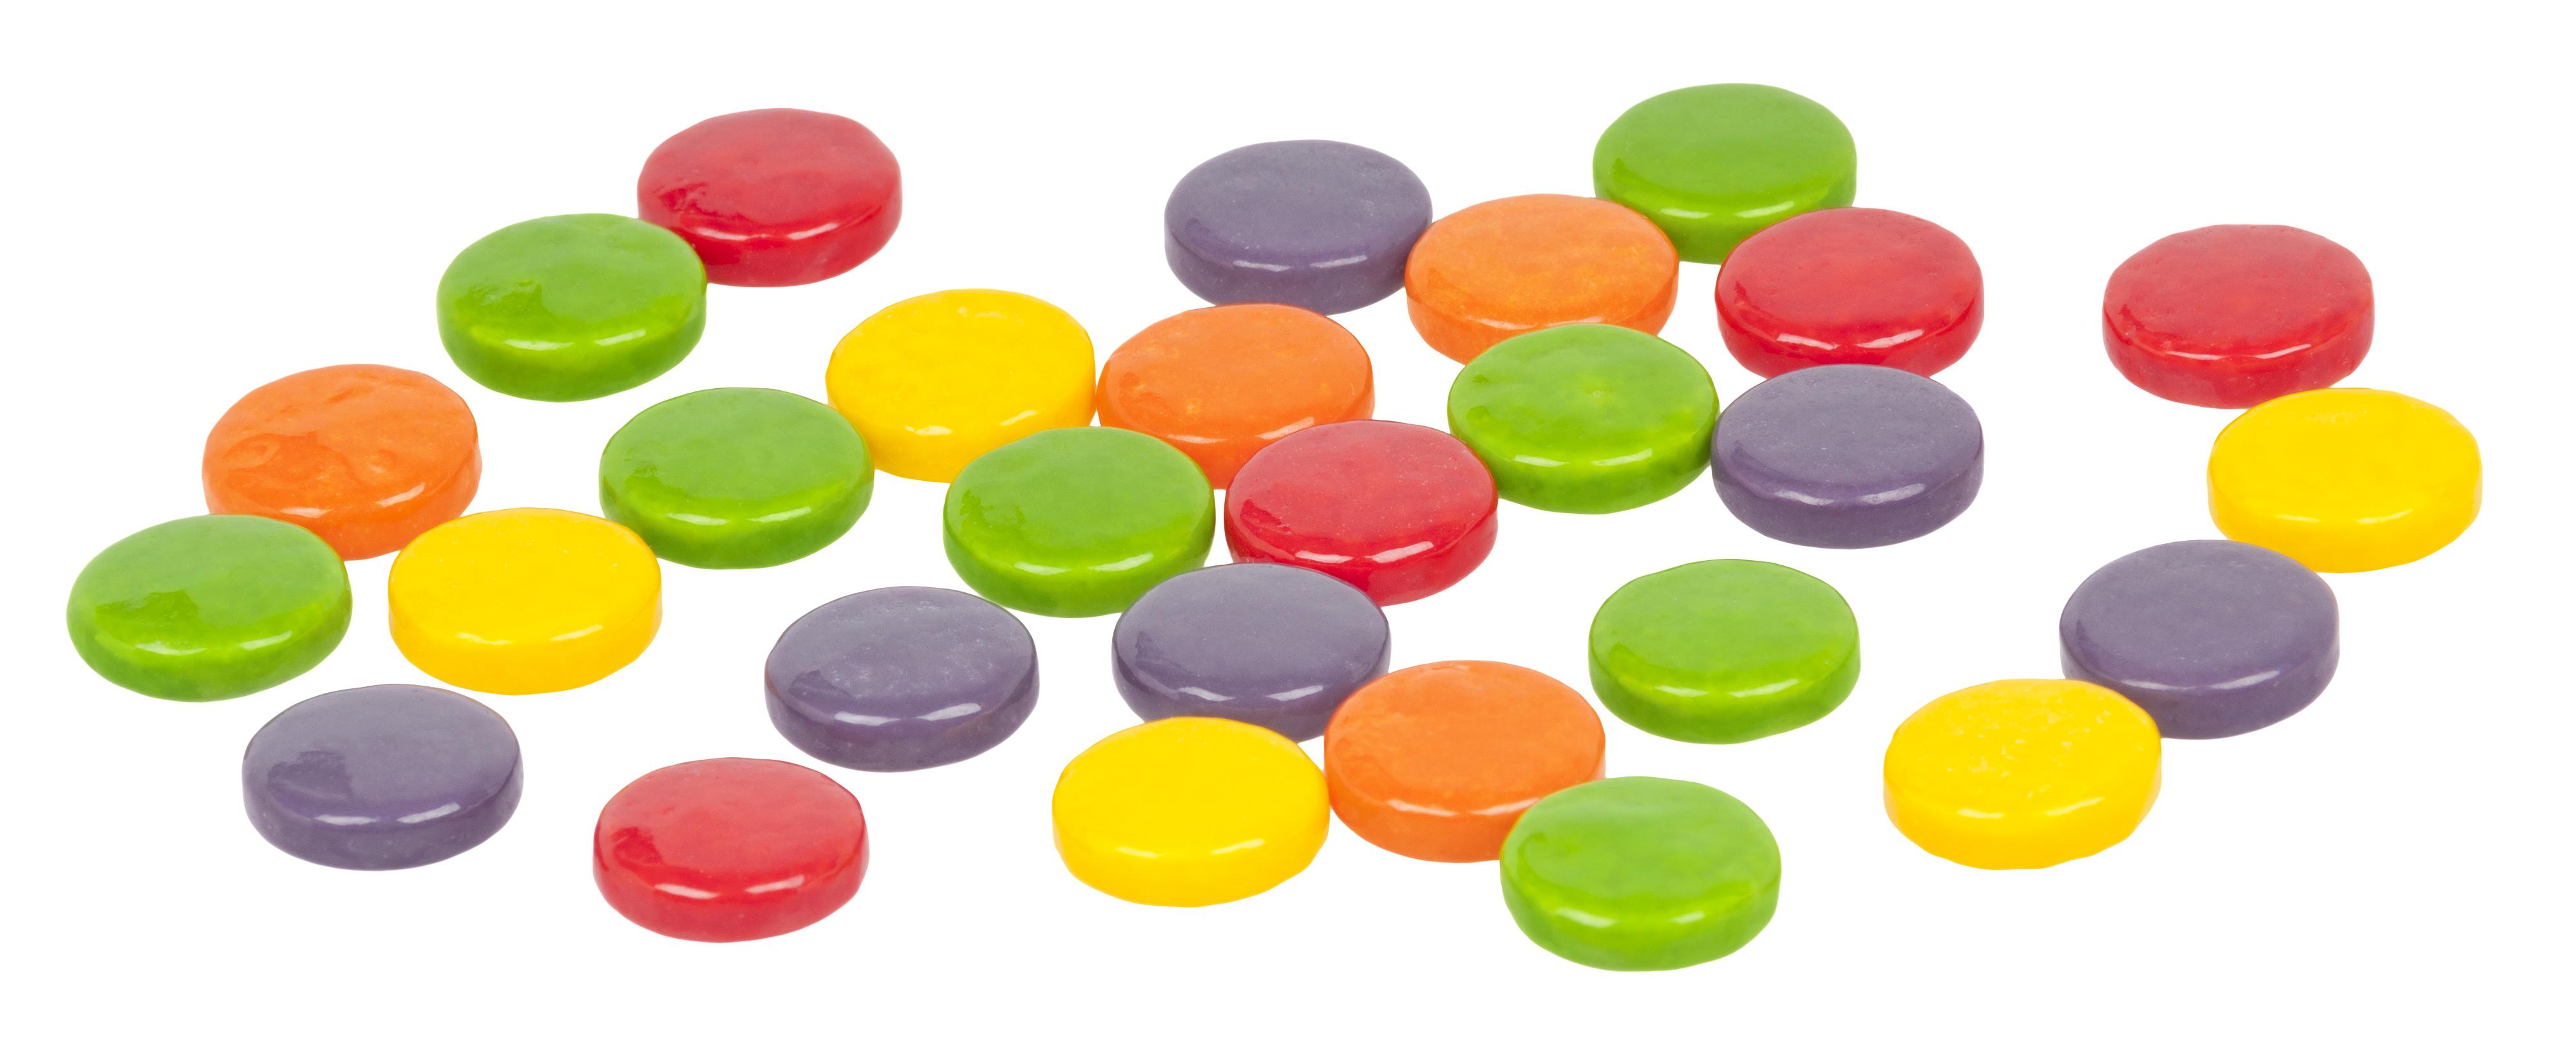 Spree (candy) - Wikipedia